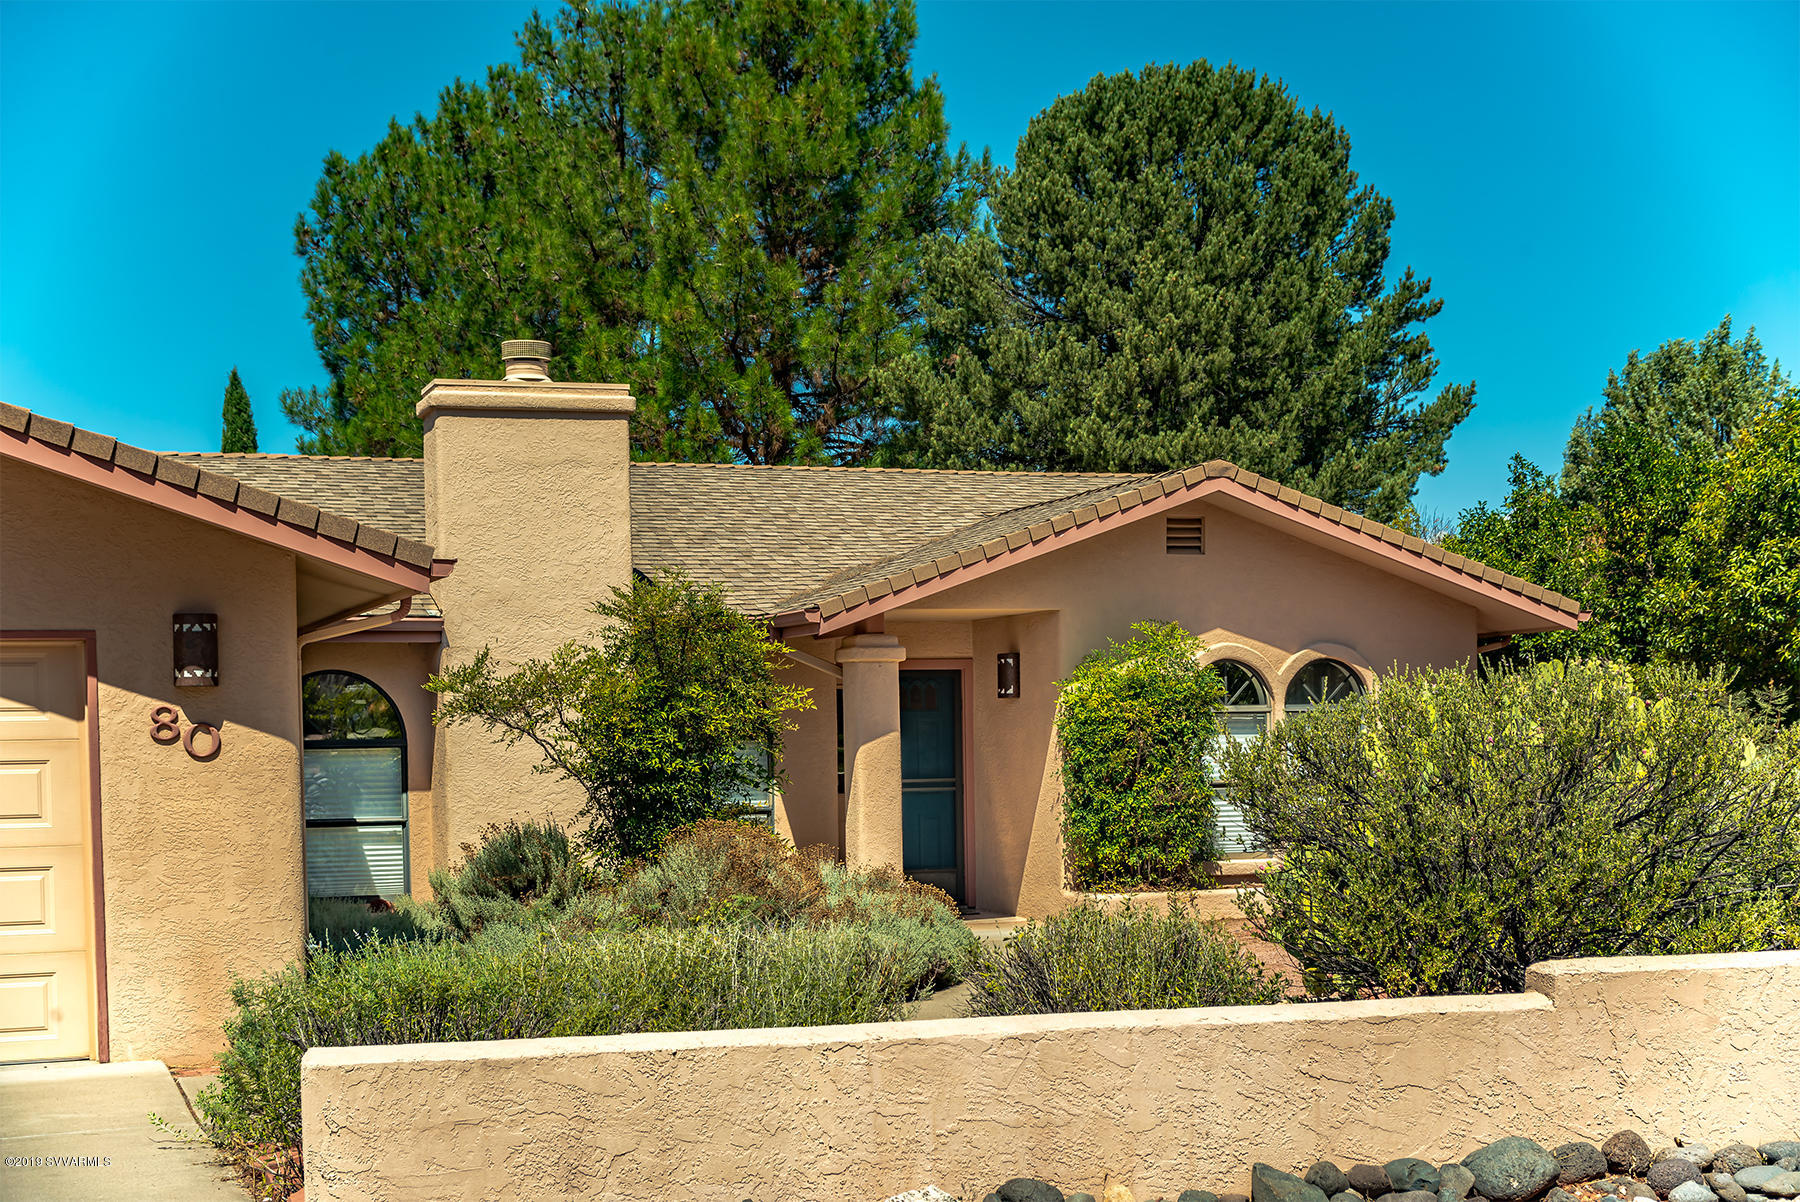 80 Rim Trail Drive Sedona, AZ 86351